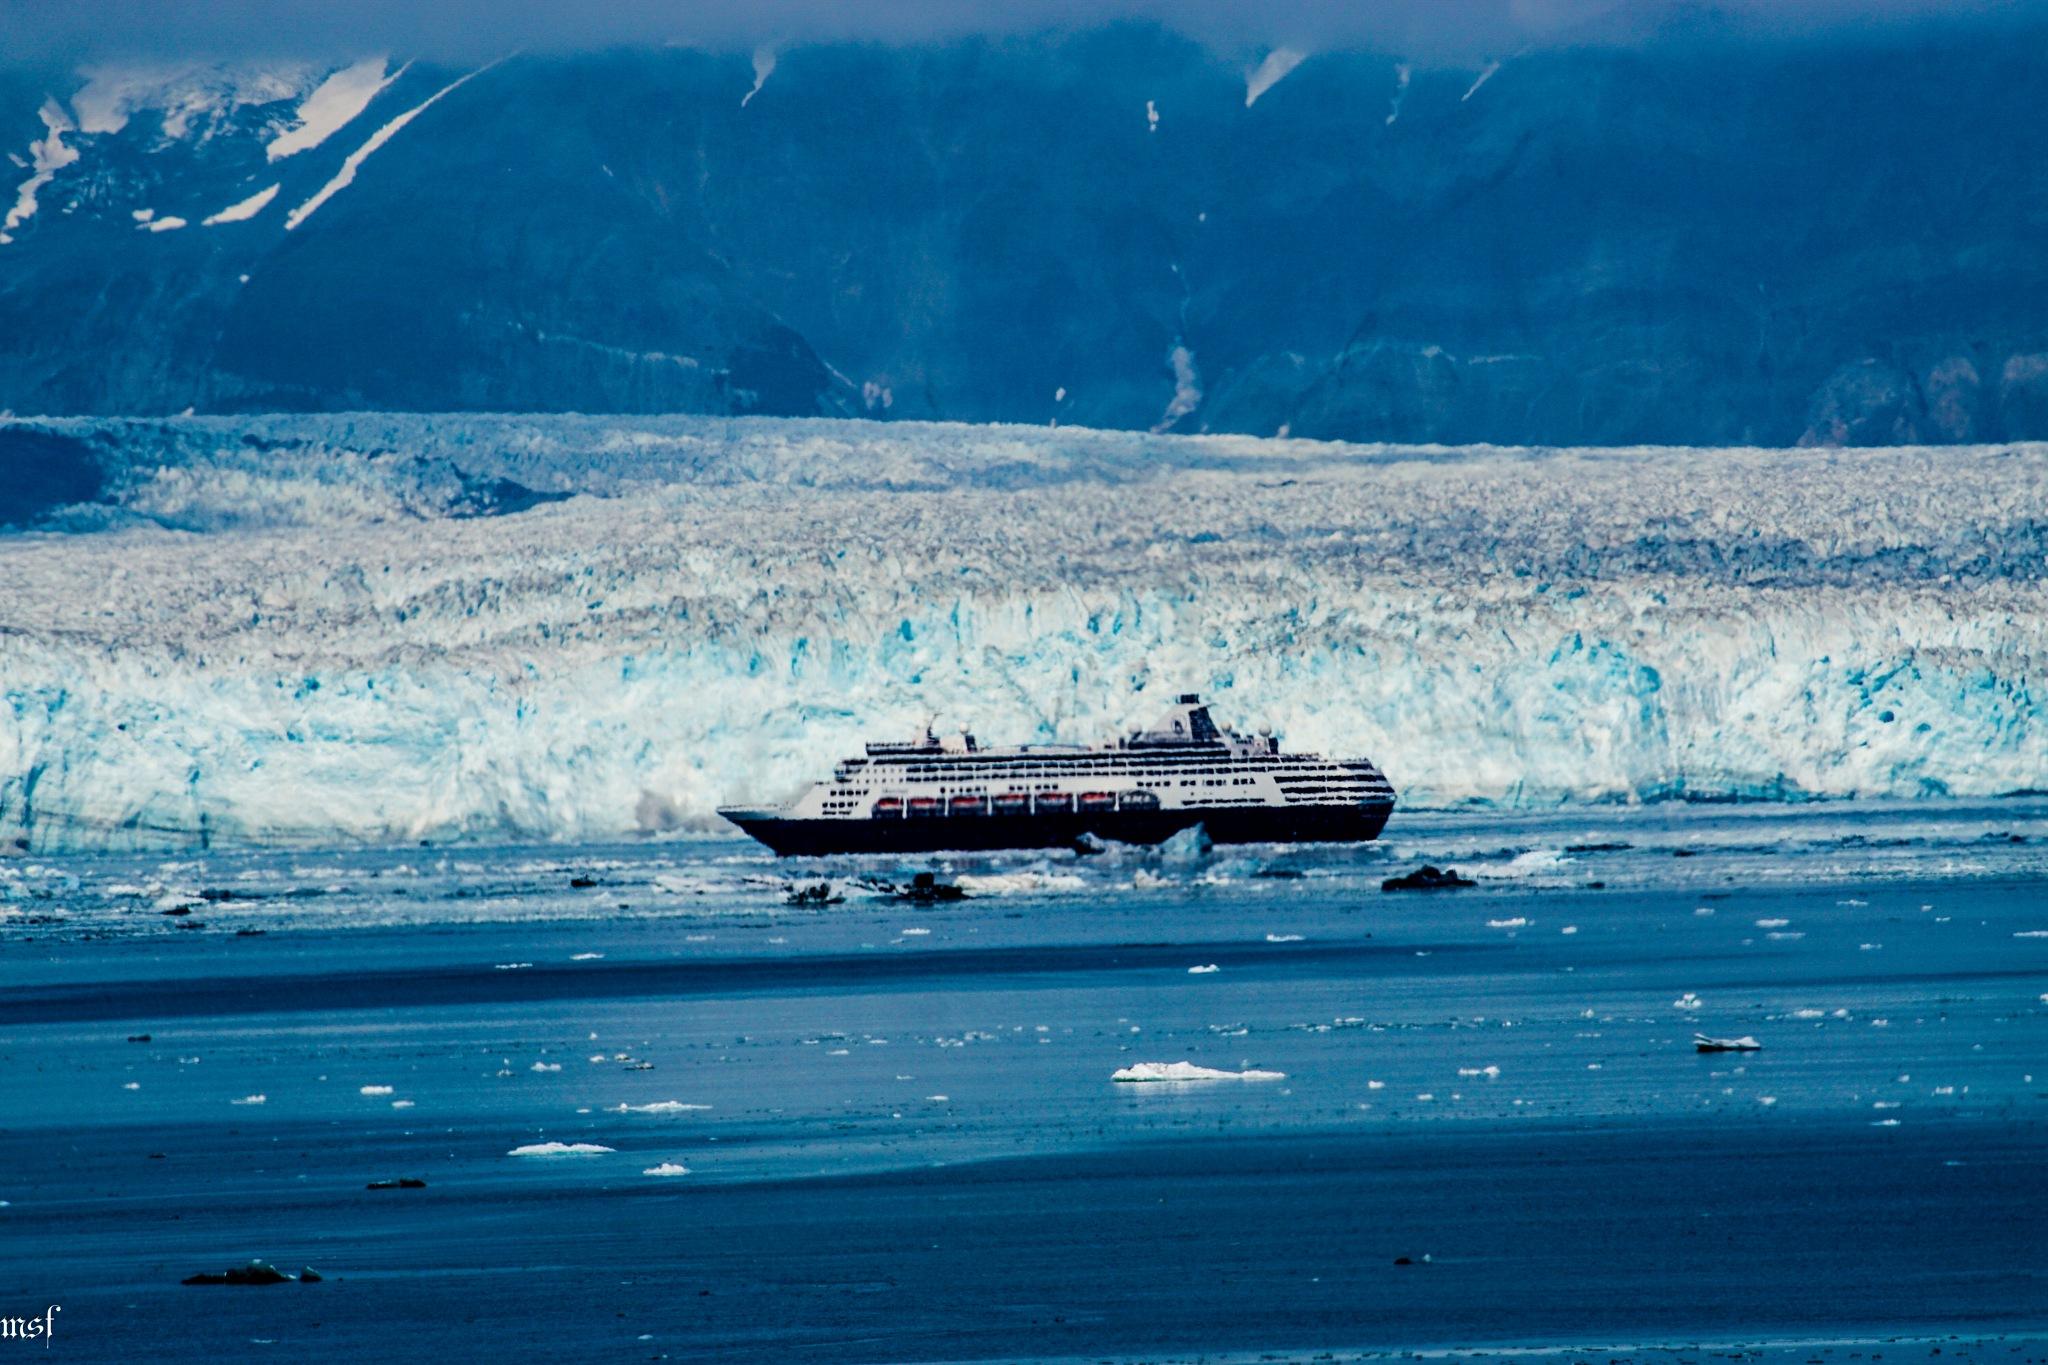 Glacier Blue by msfletcher